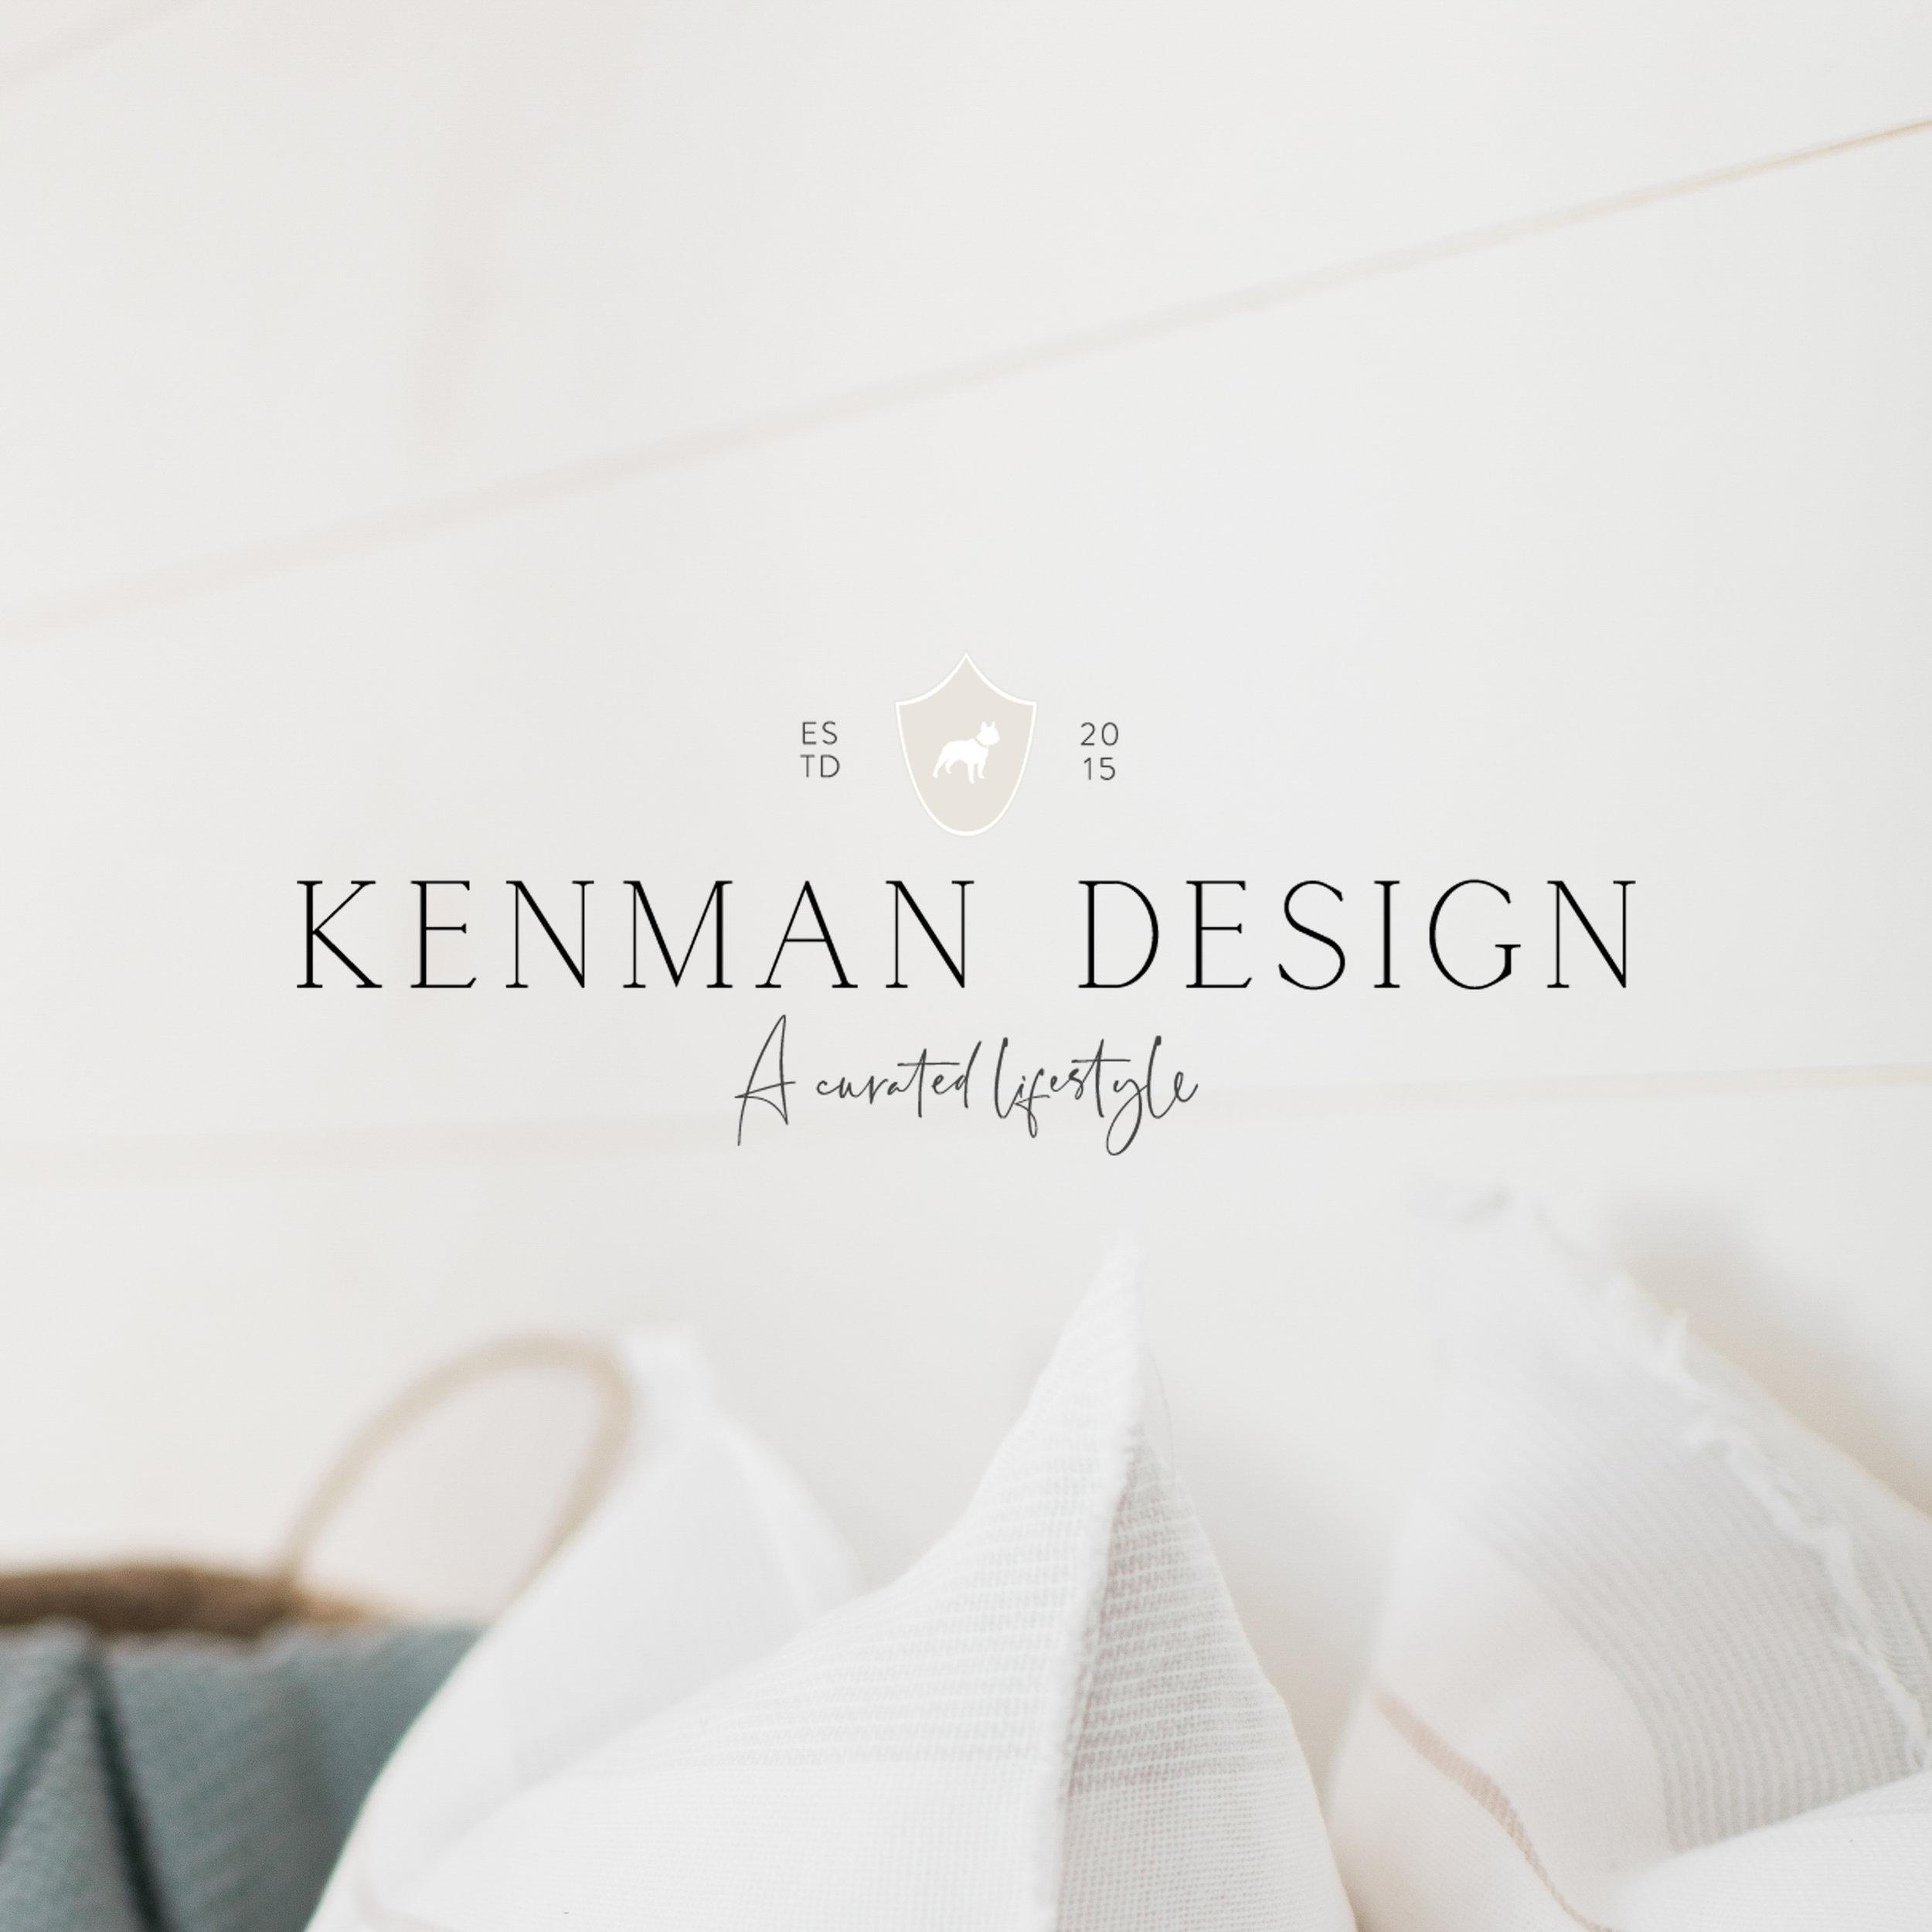 kenman_social.jpg